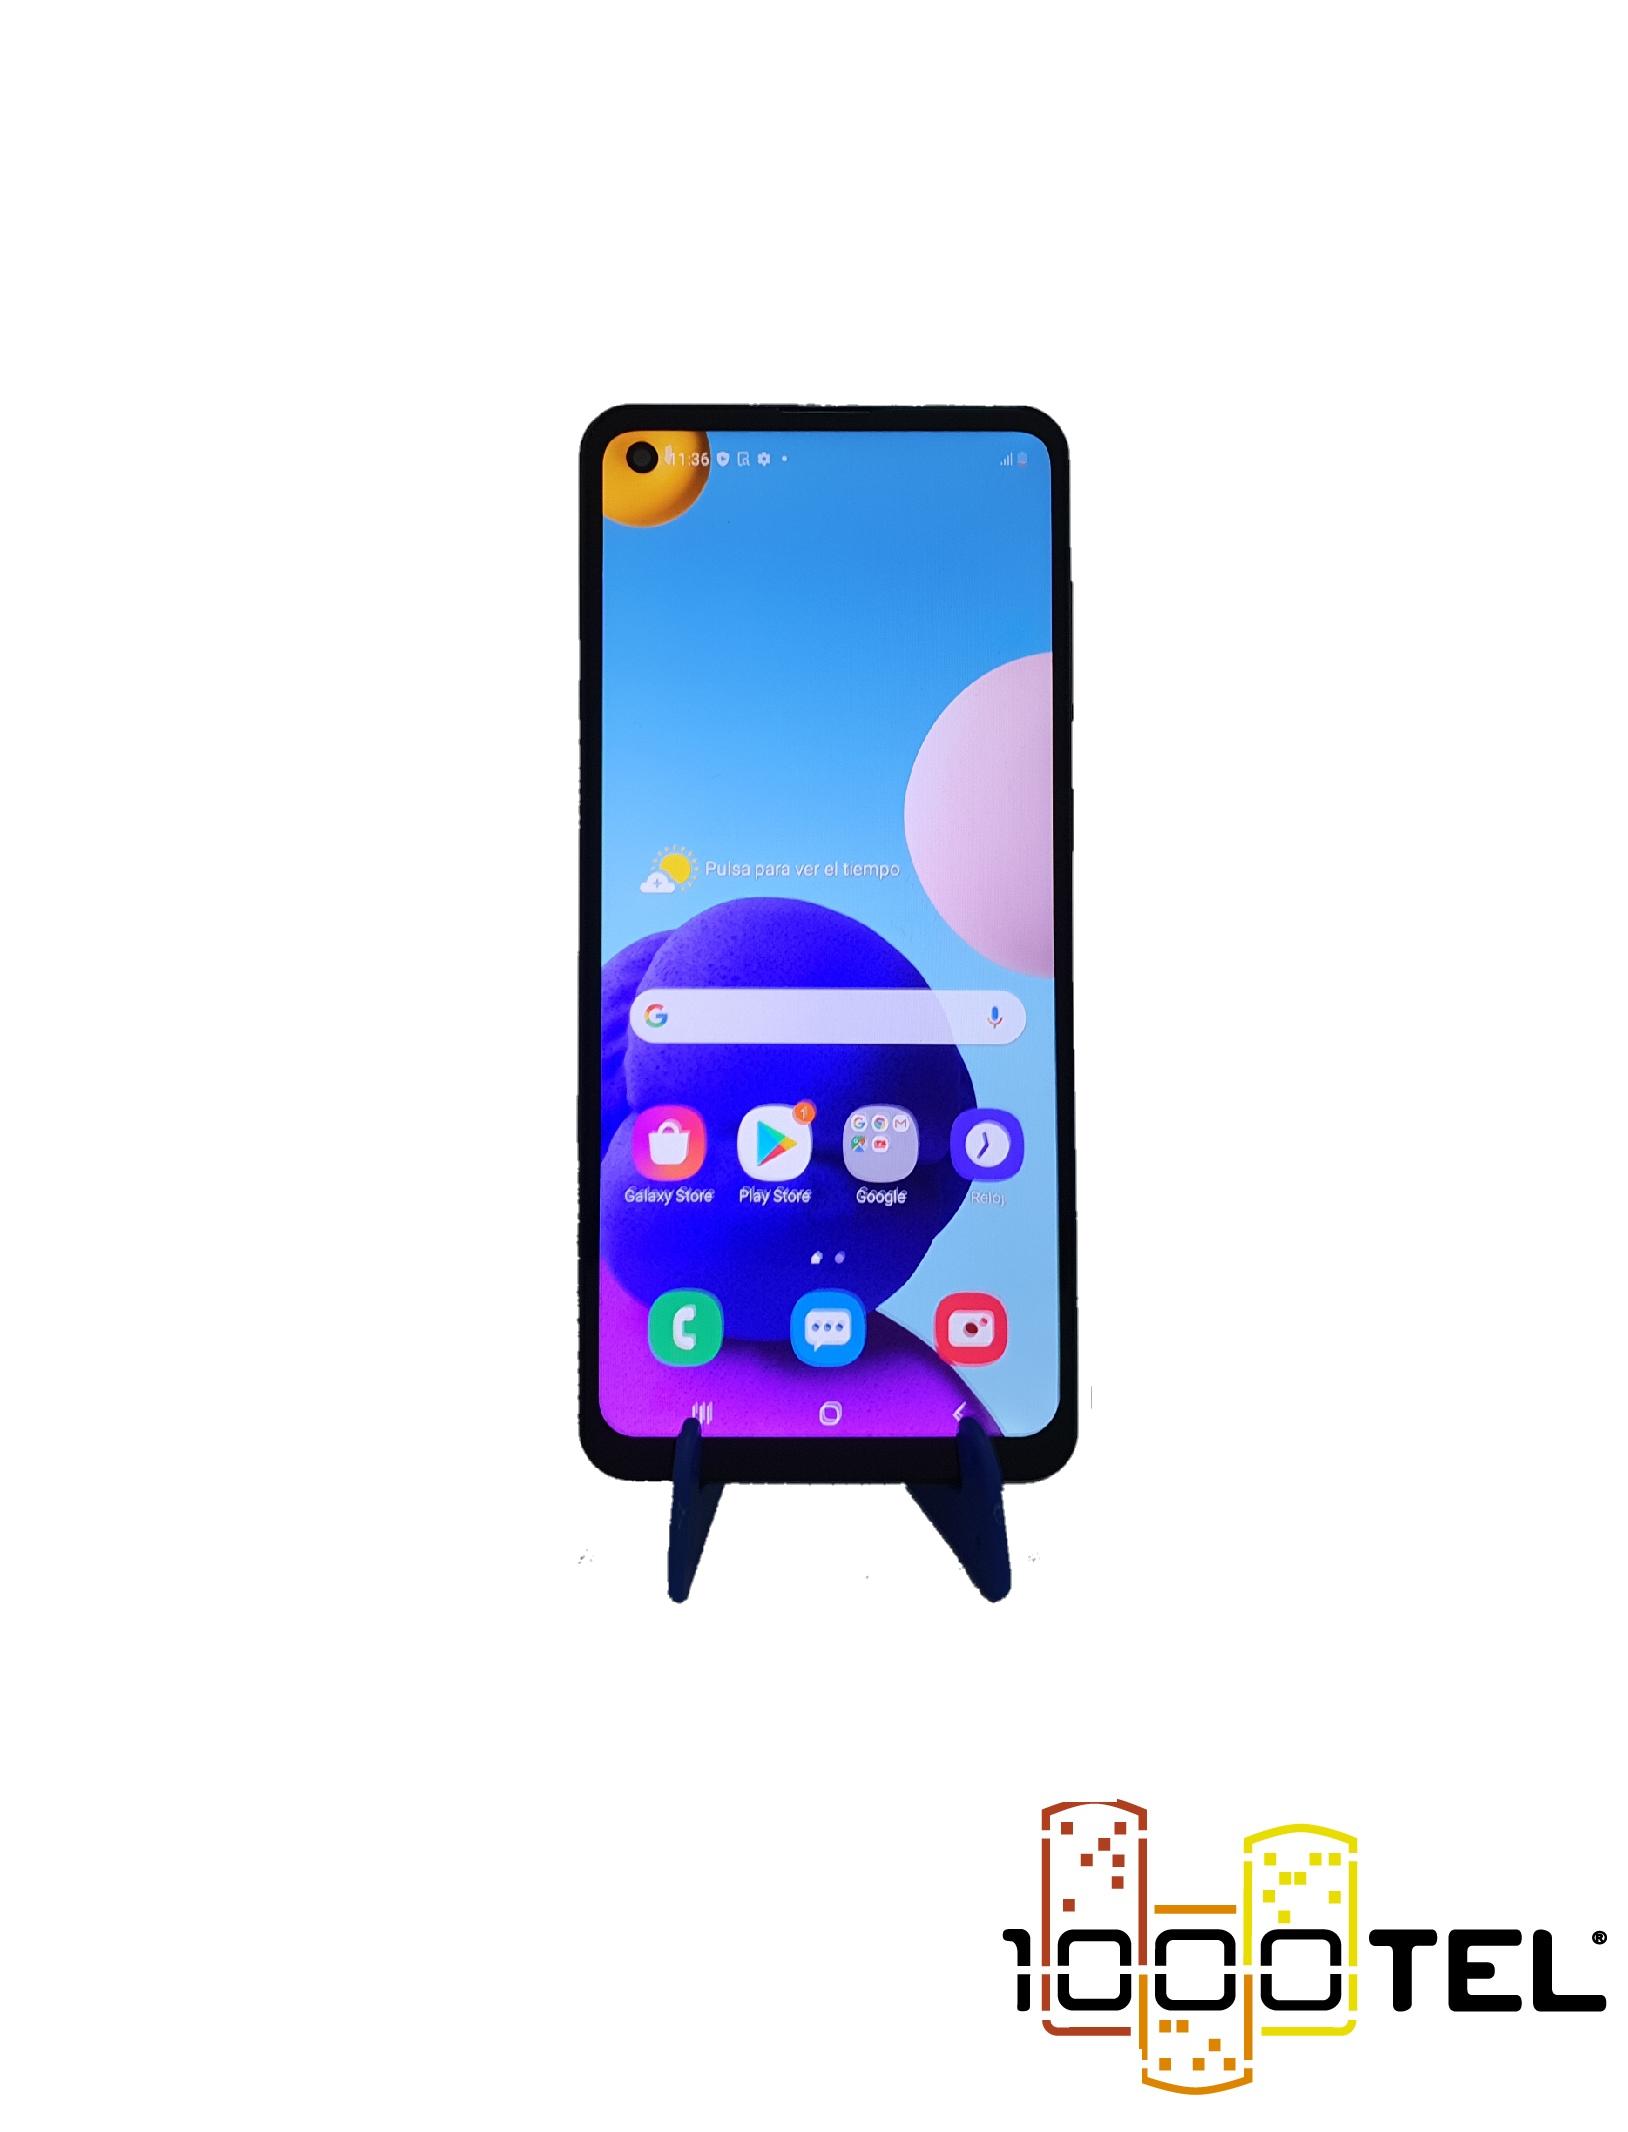 Samsung Galaxy A21s #1